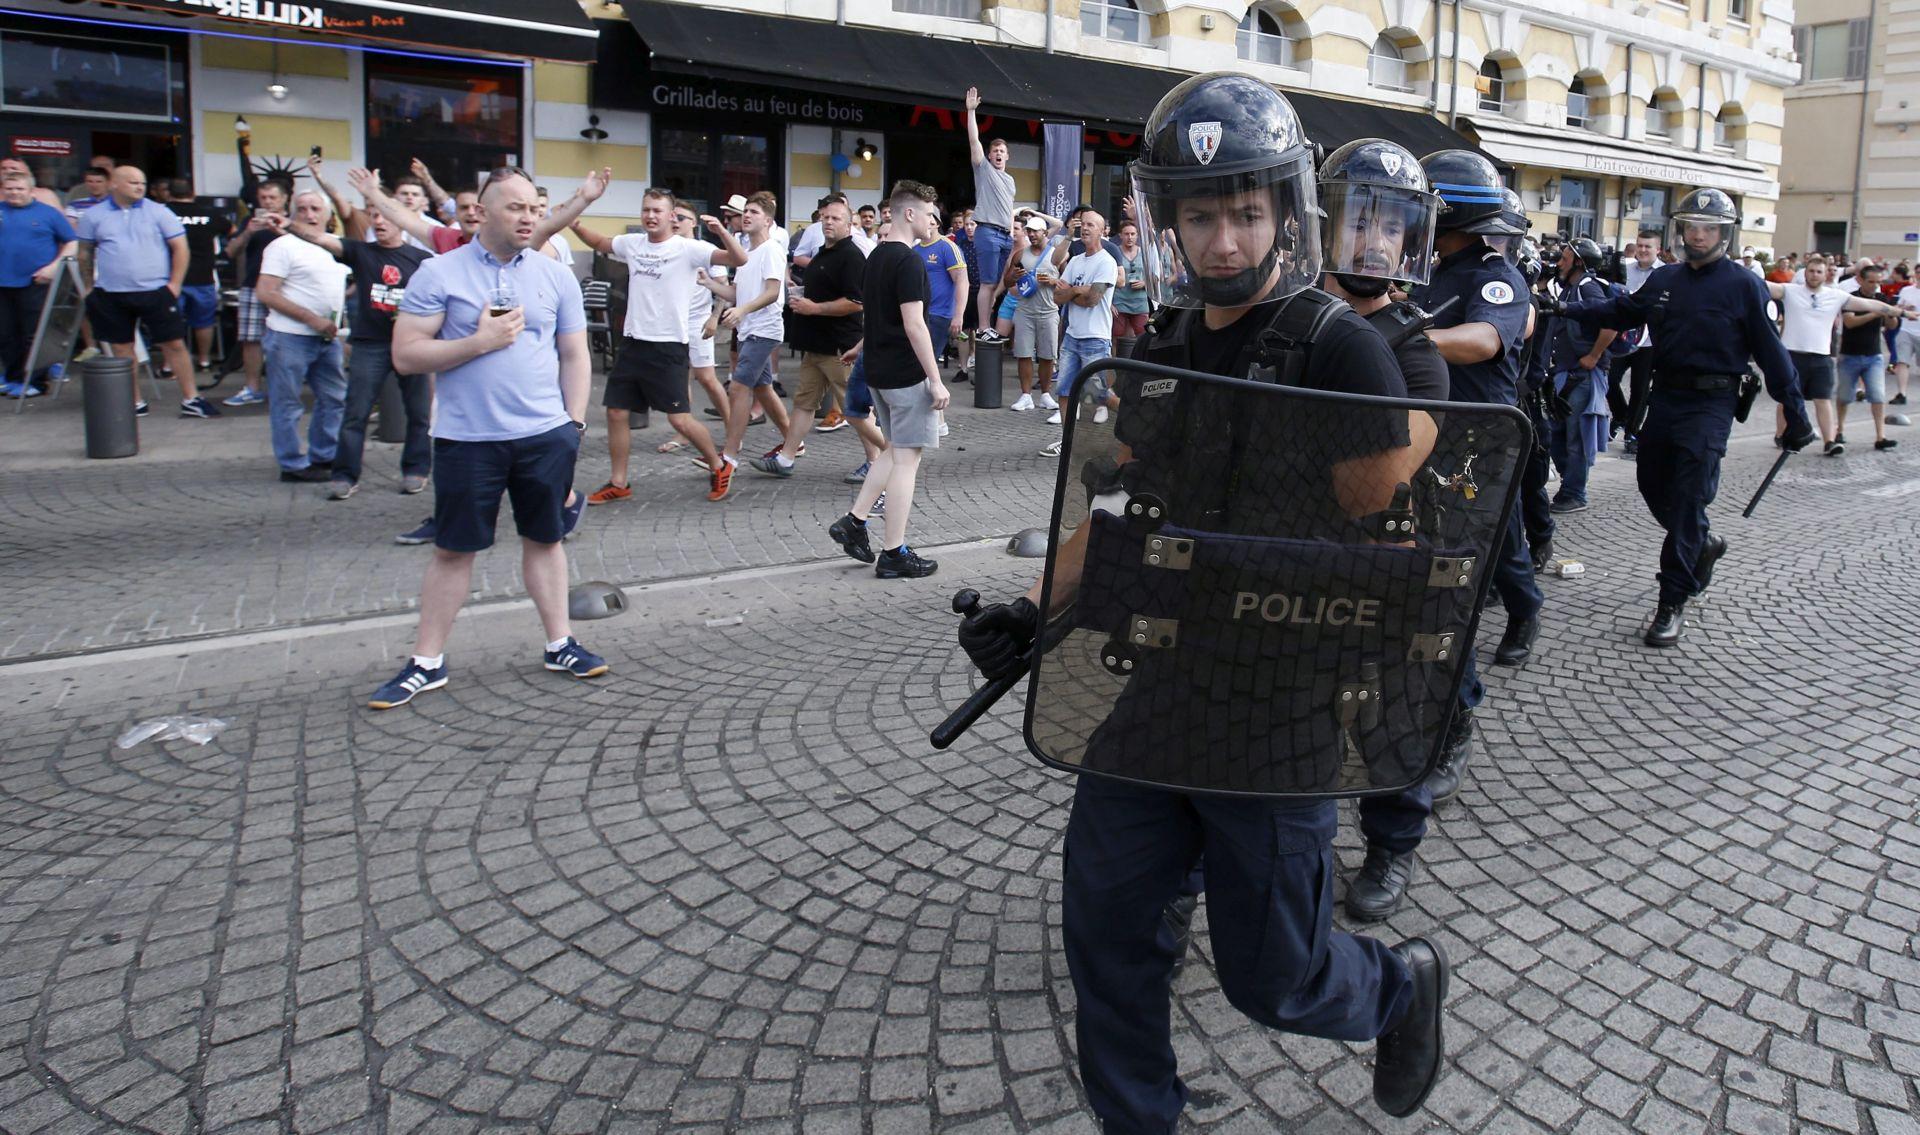 VIDEO: NOVI OKRŠAJI UOČI POČETKA EURO-A Francuska policija suzavcem na Engleze